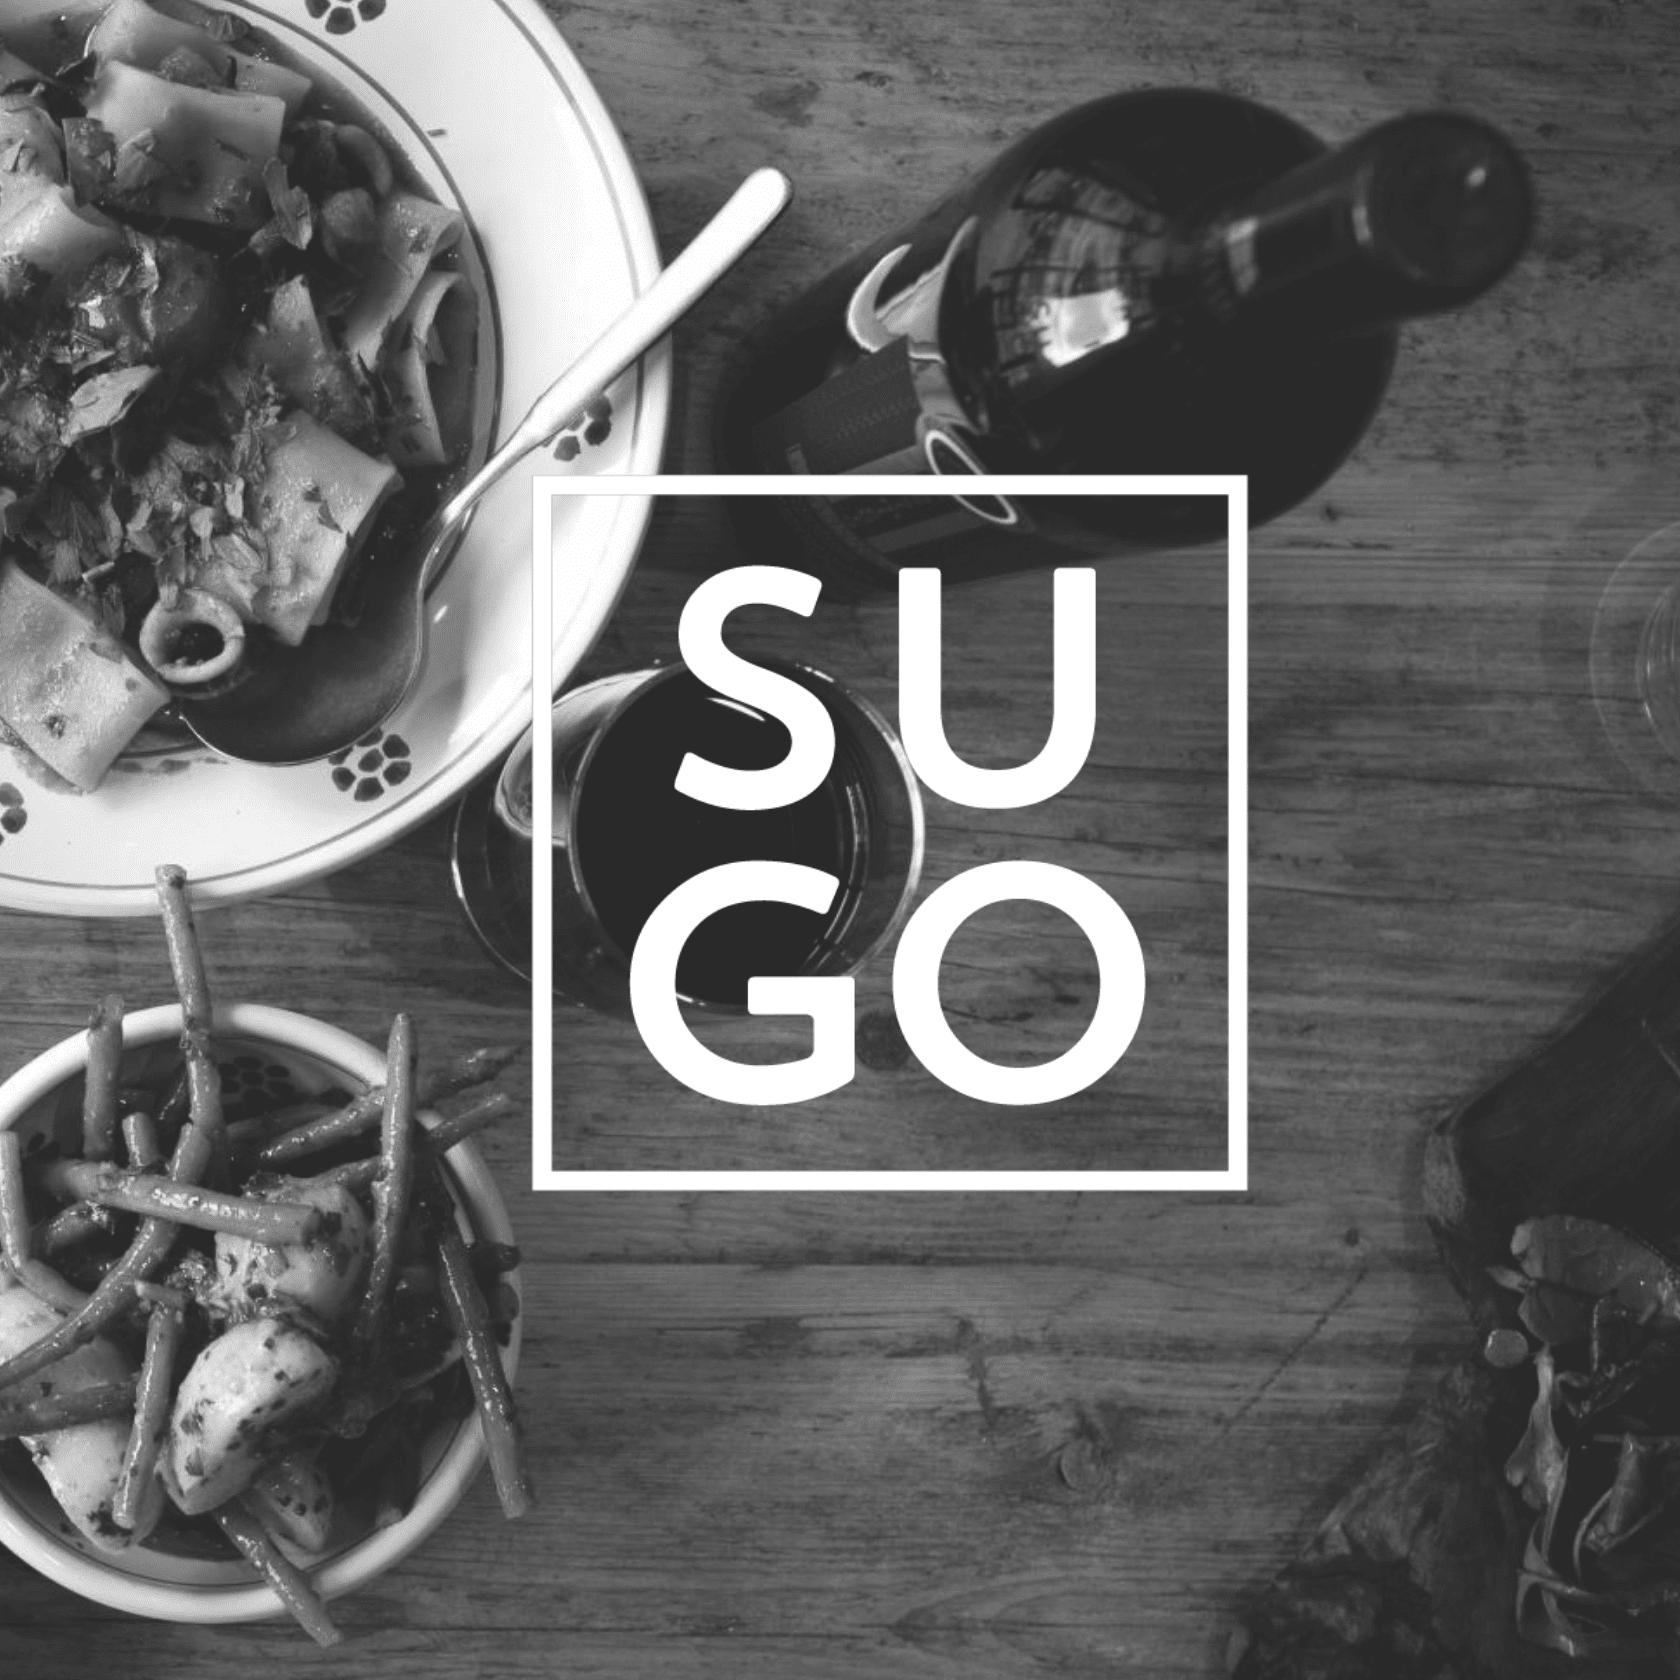 Sugo - branding identity and website design